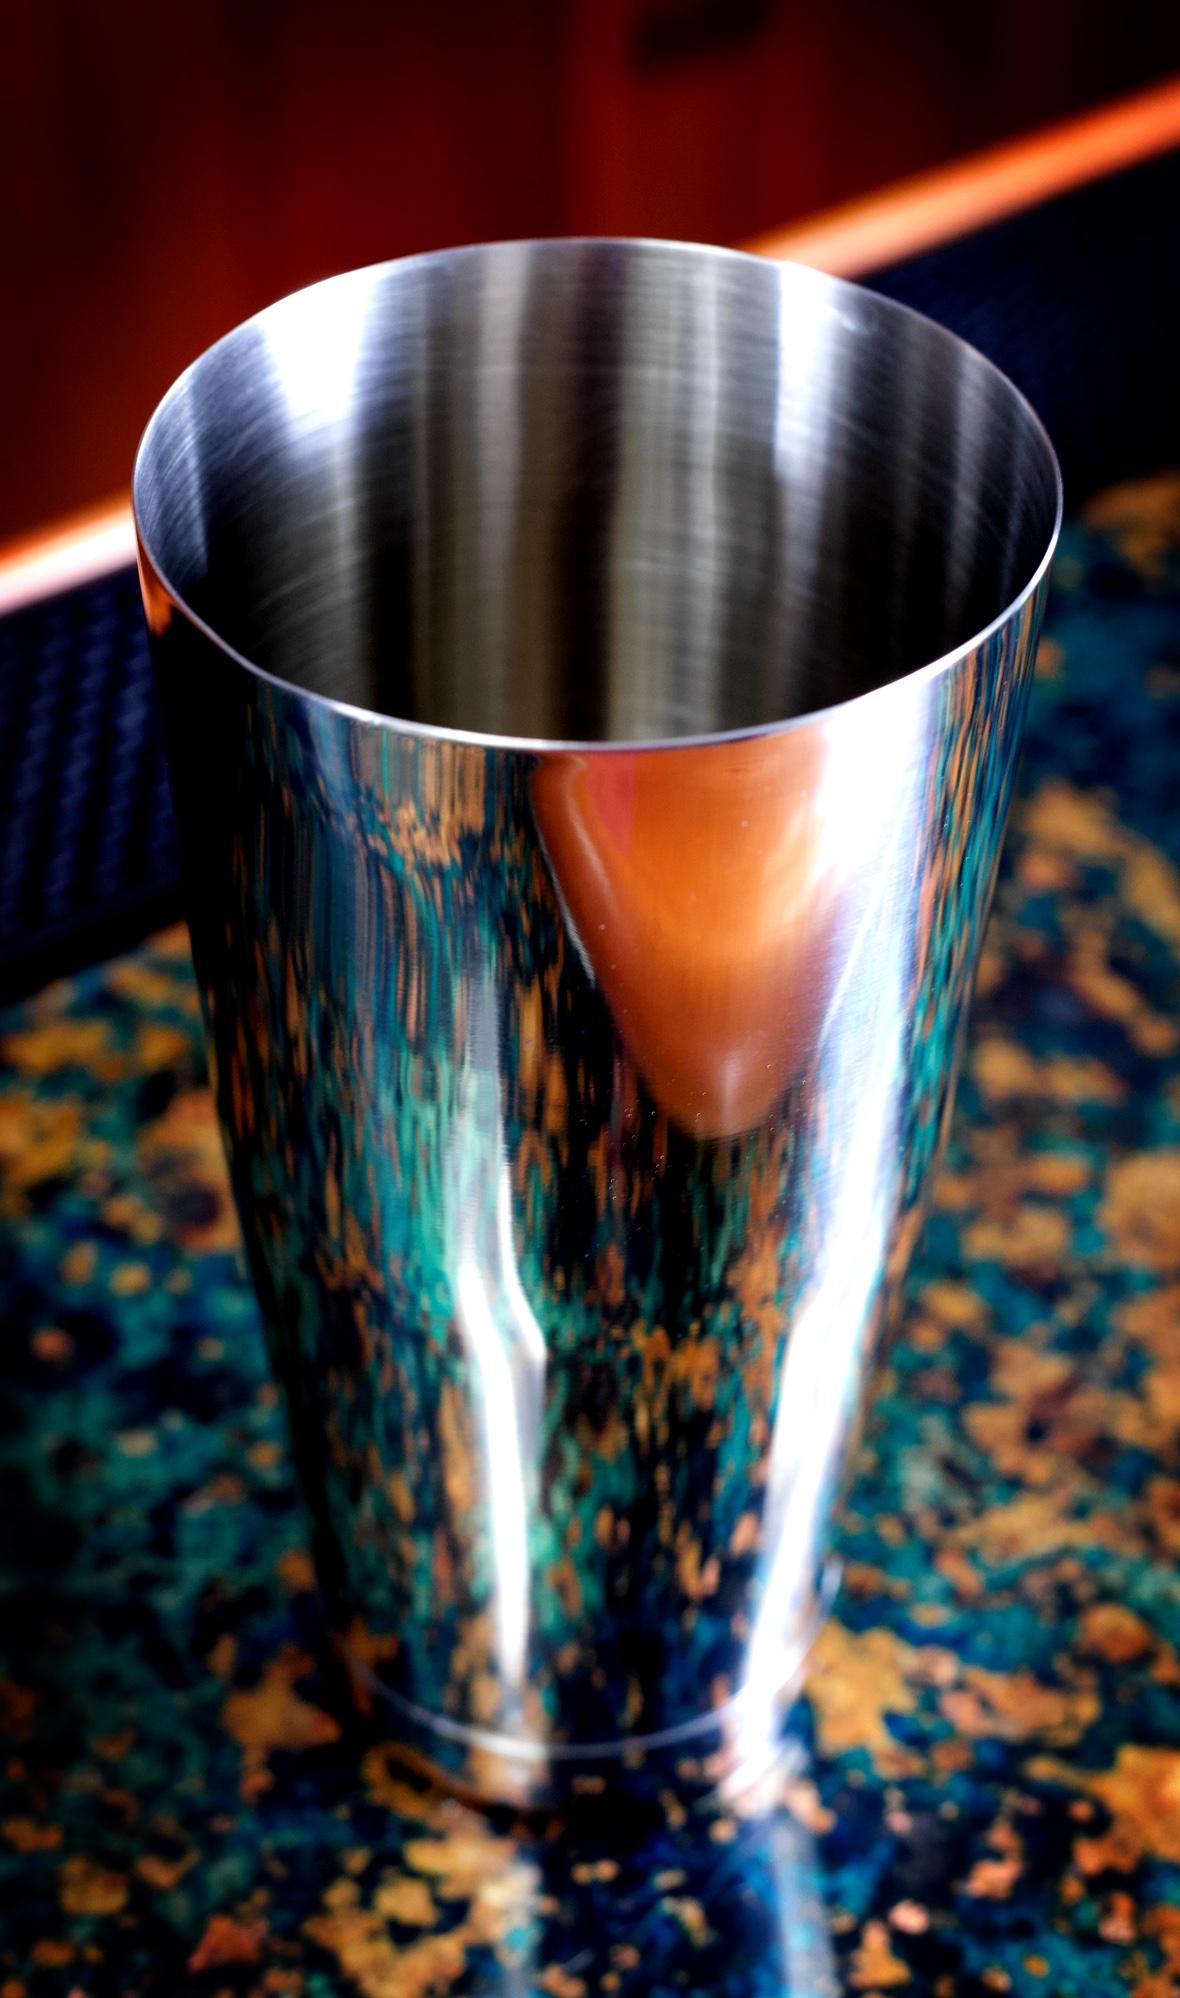 Barfly 28 oz polished shaker tin